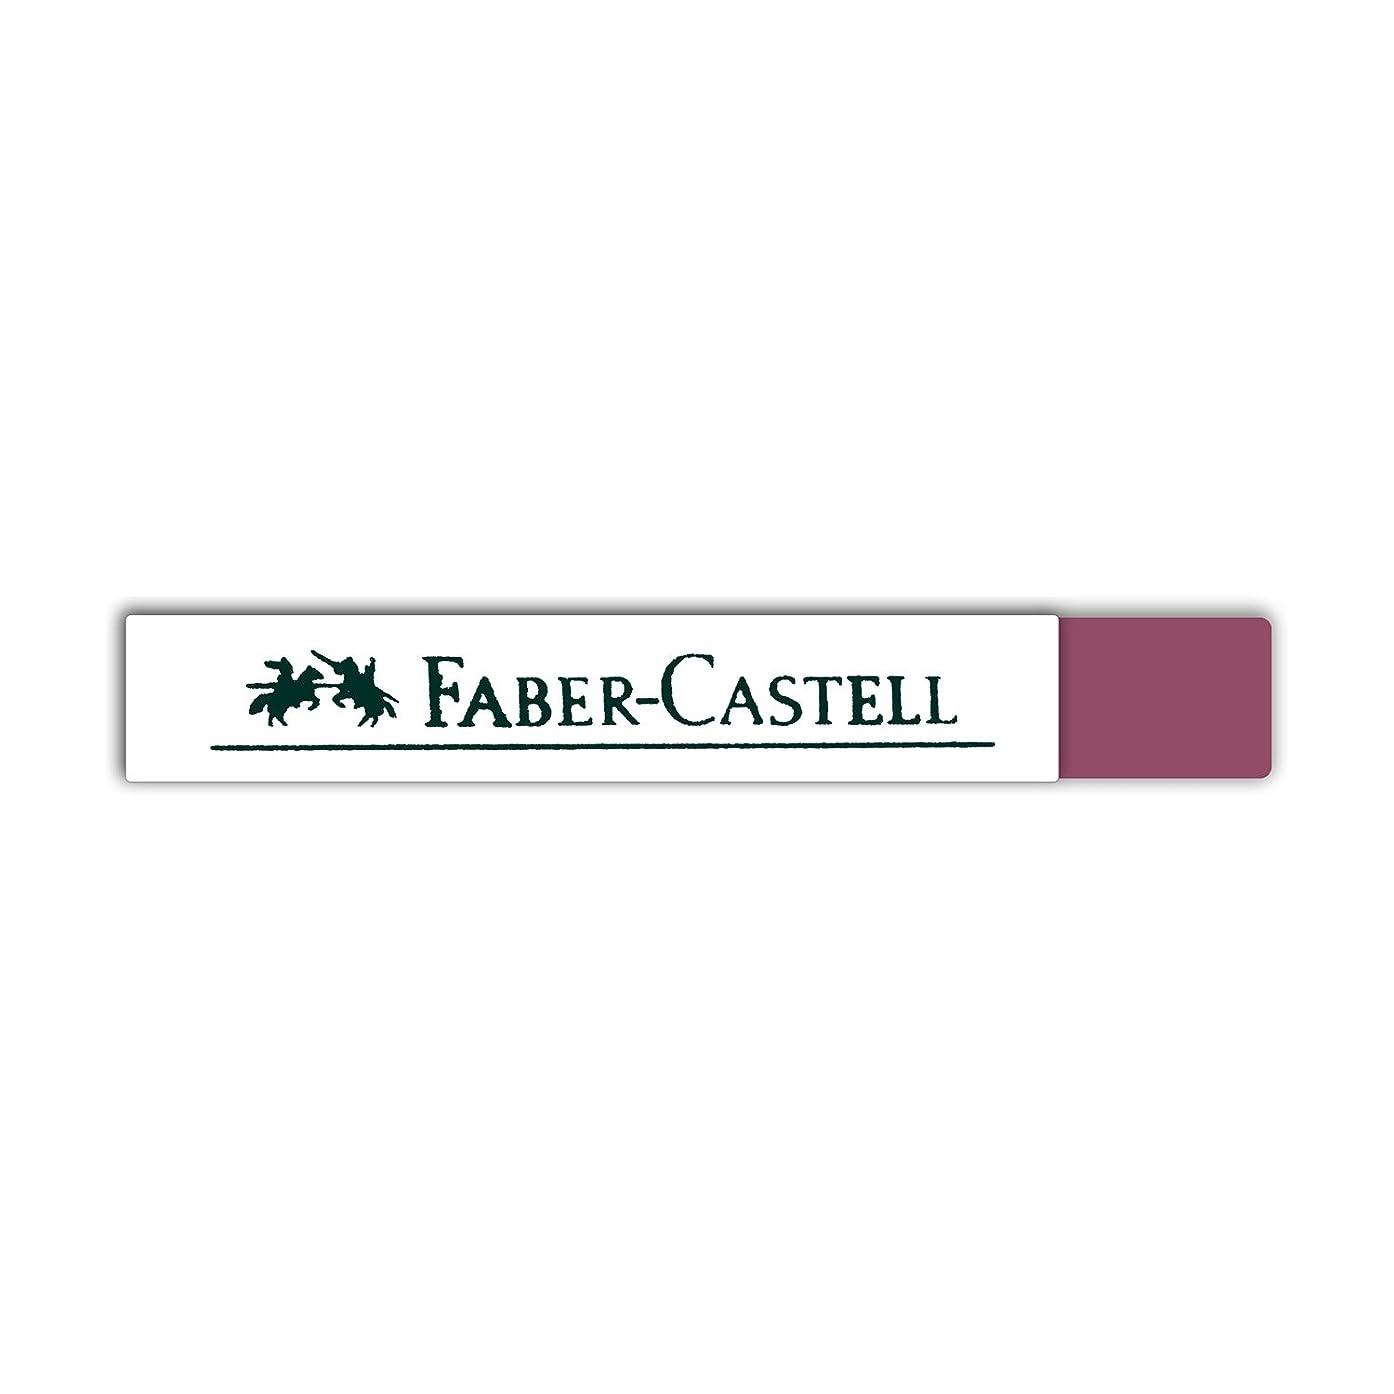 12 Studio Quality Soft Pastels - Magenta - Faber Castell